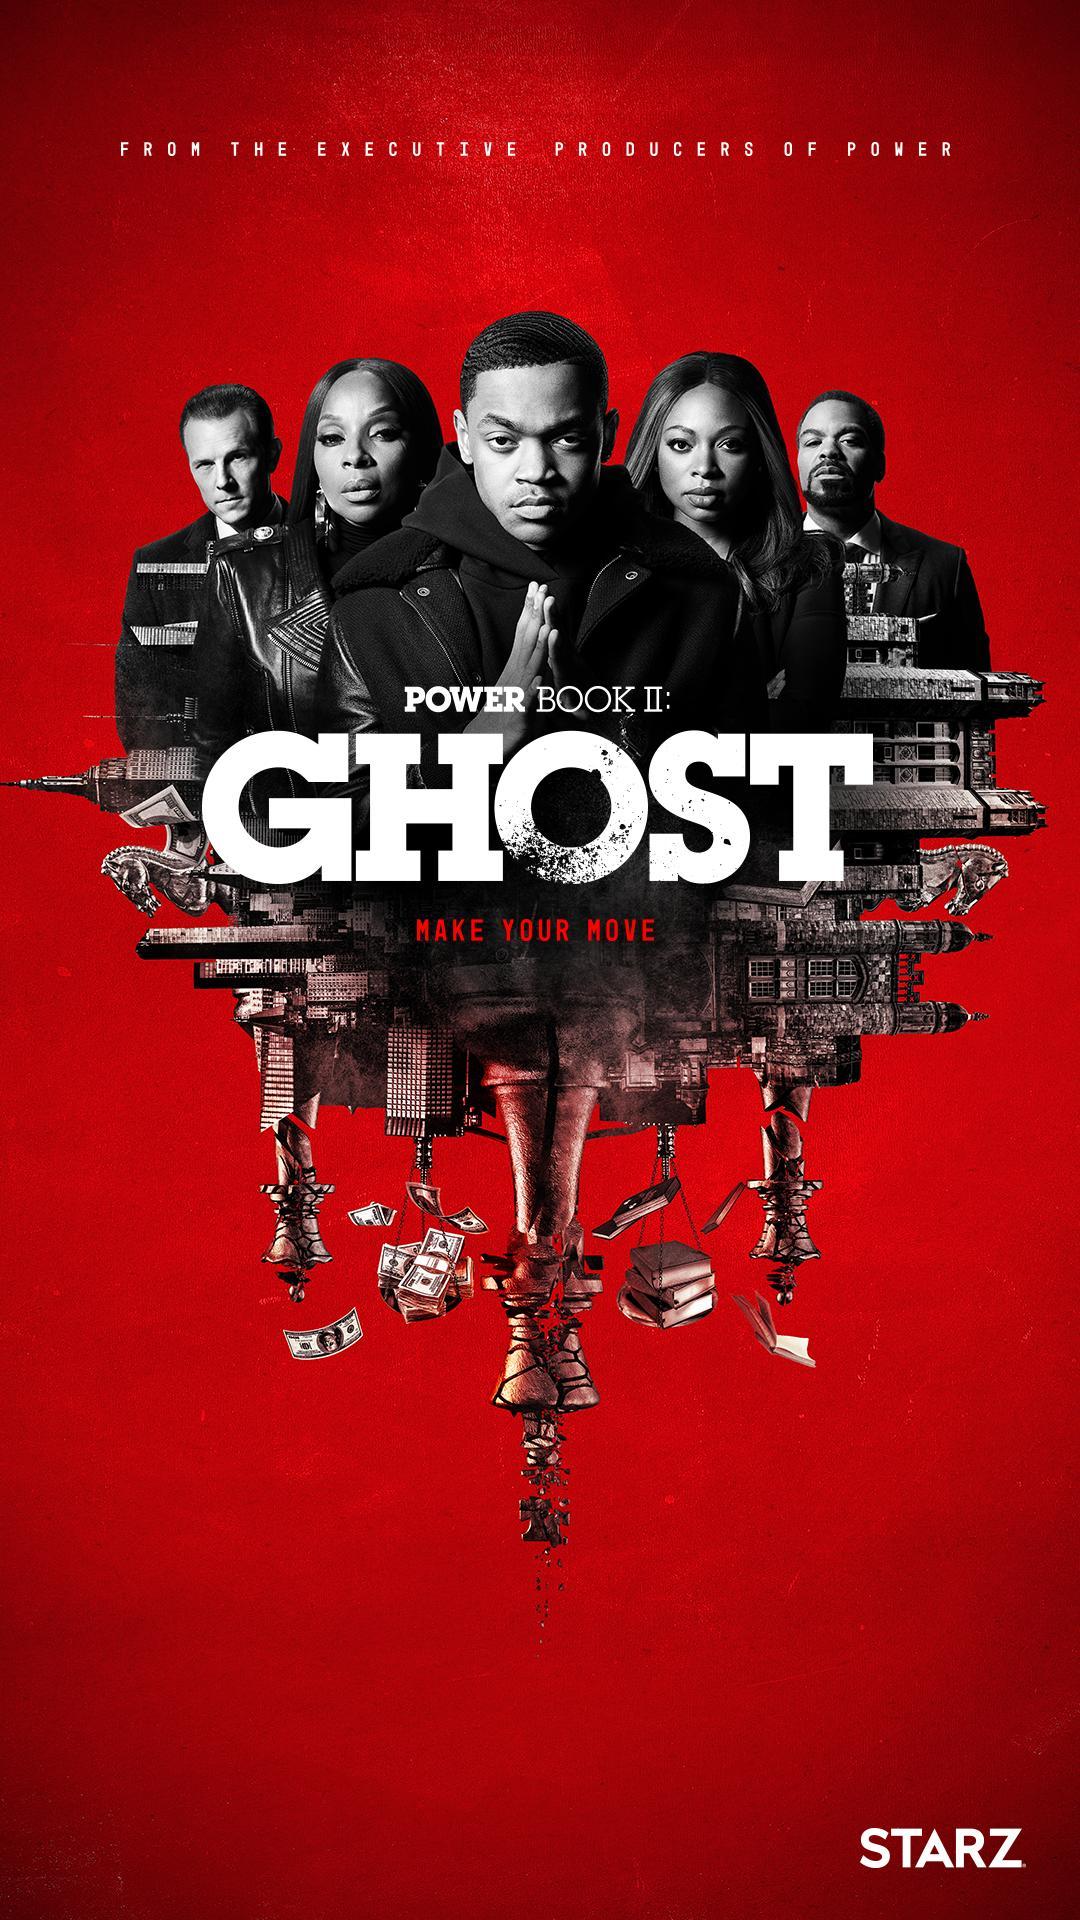 Power Book II: Ghost (TV Series 2020– ) - IMDb